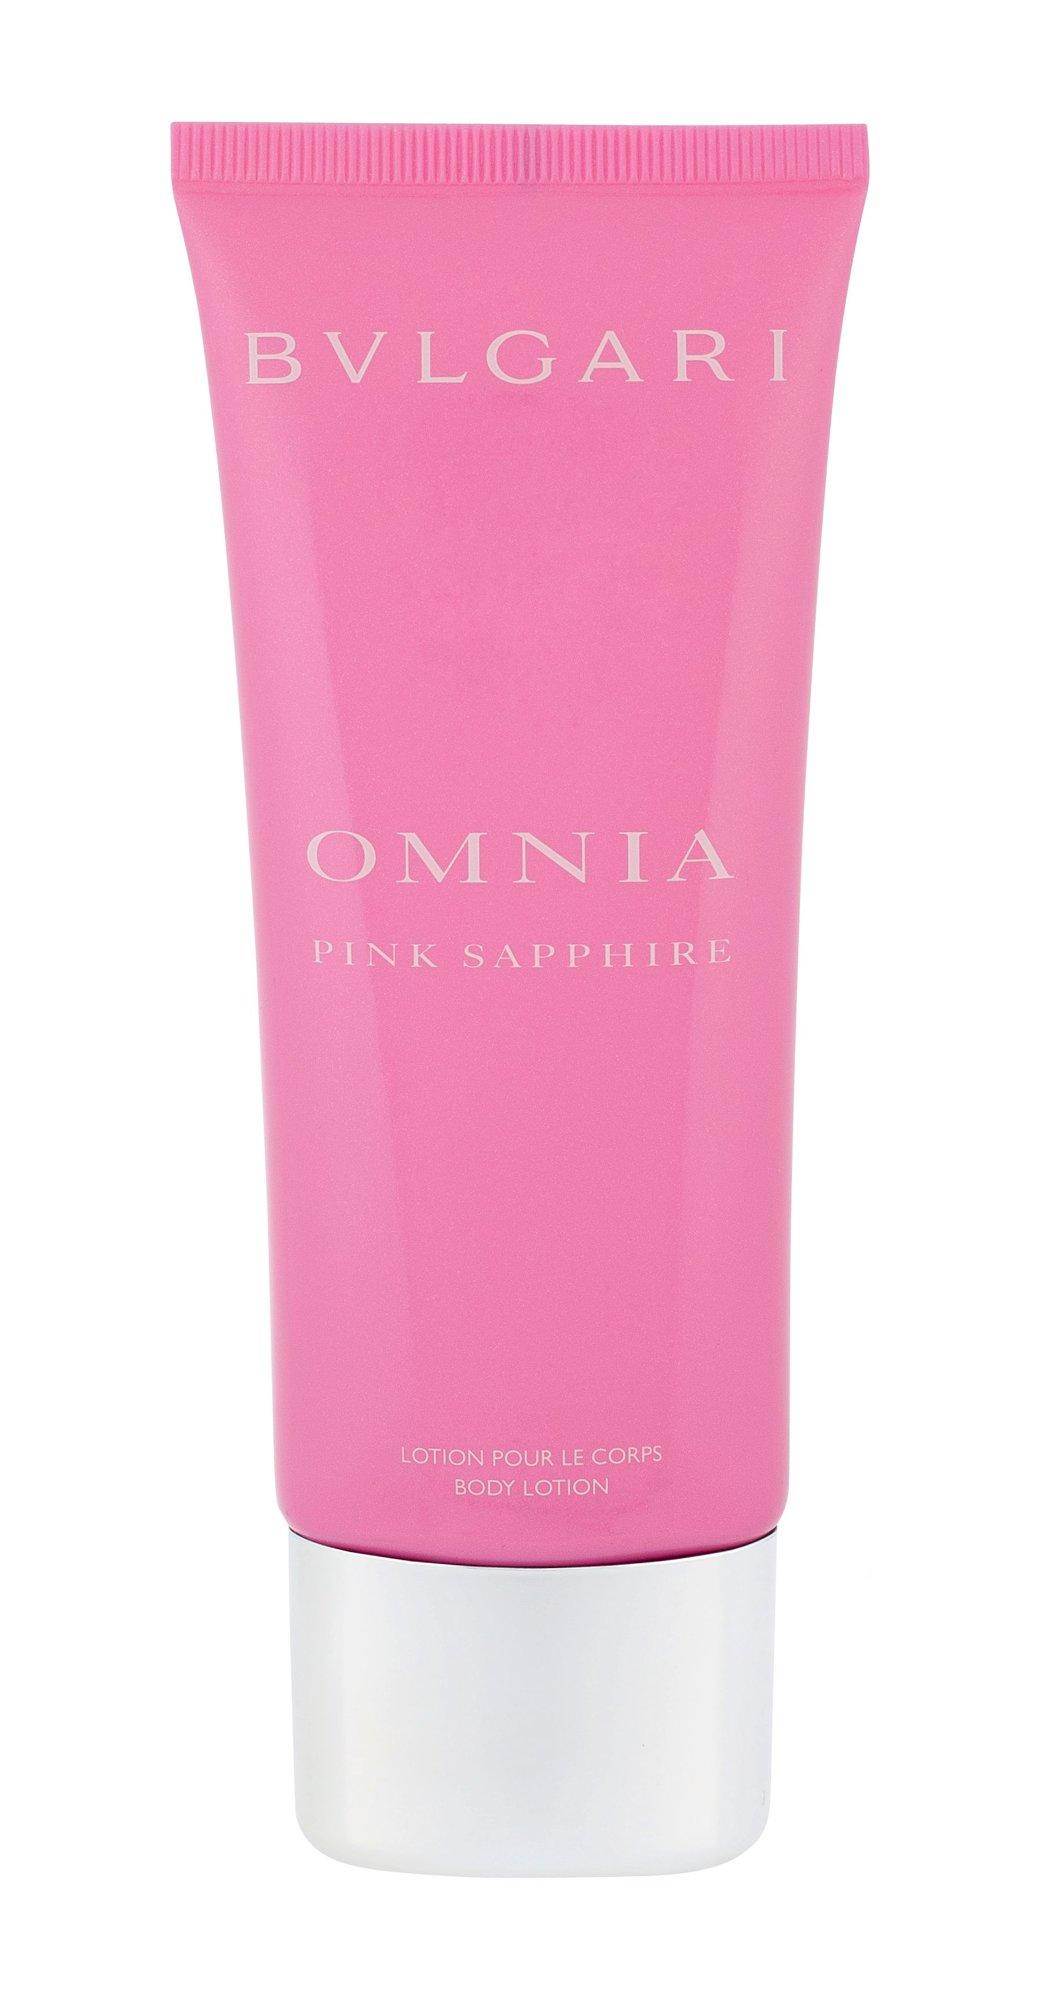 Bvlgari Omnia Pink Sapphire Body Lotion 100ml